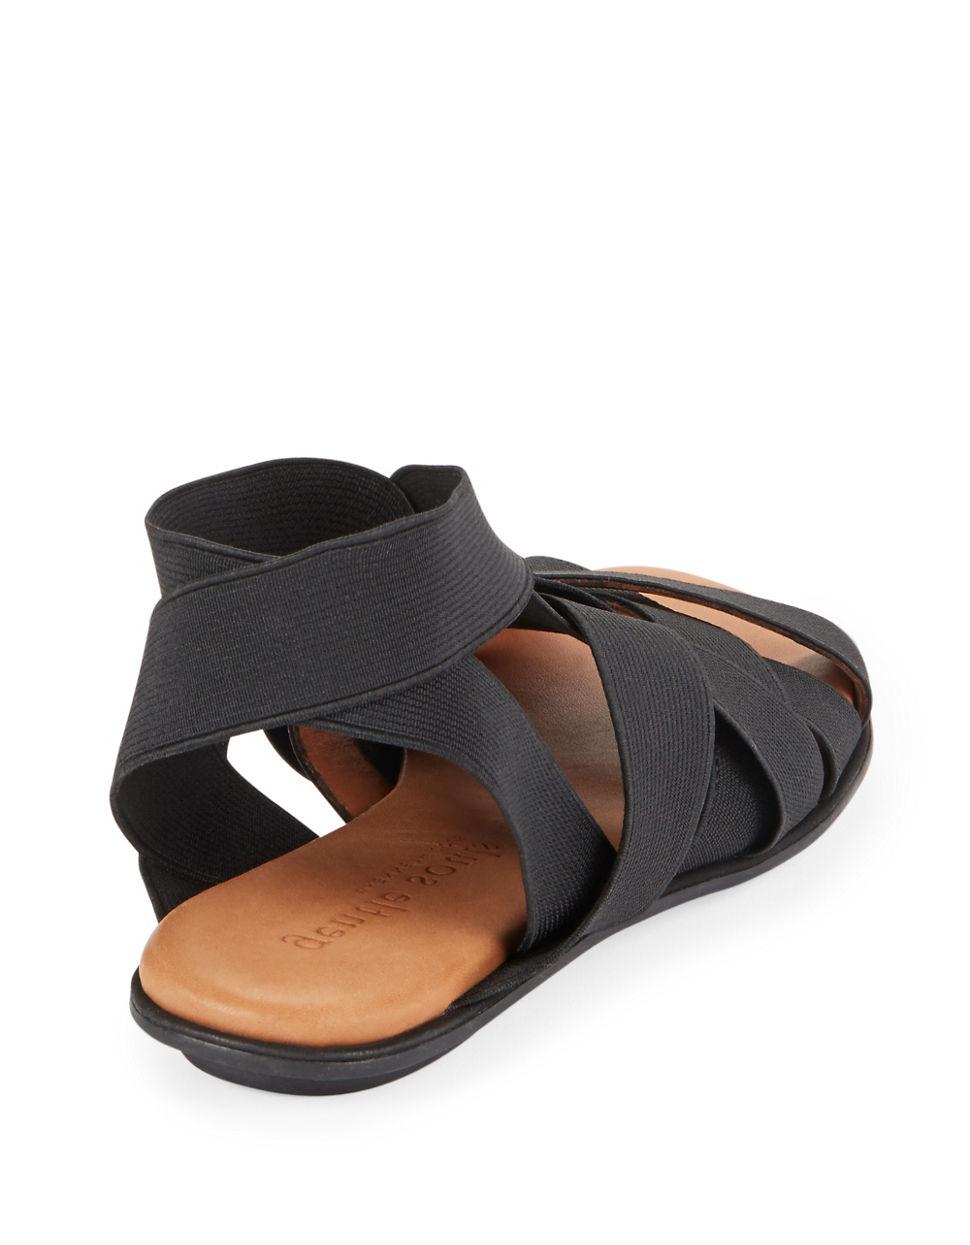 Gentle Souls Bari Elastic Strap Sandals In Black Lyst